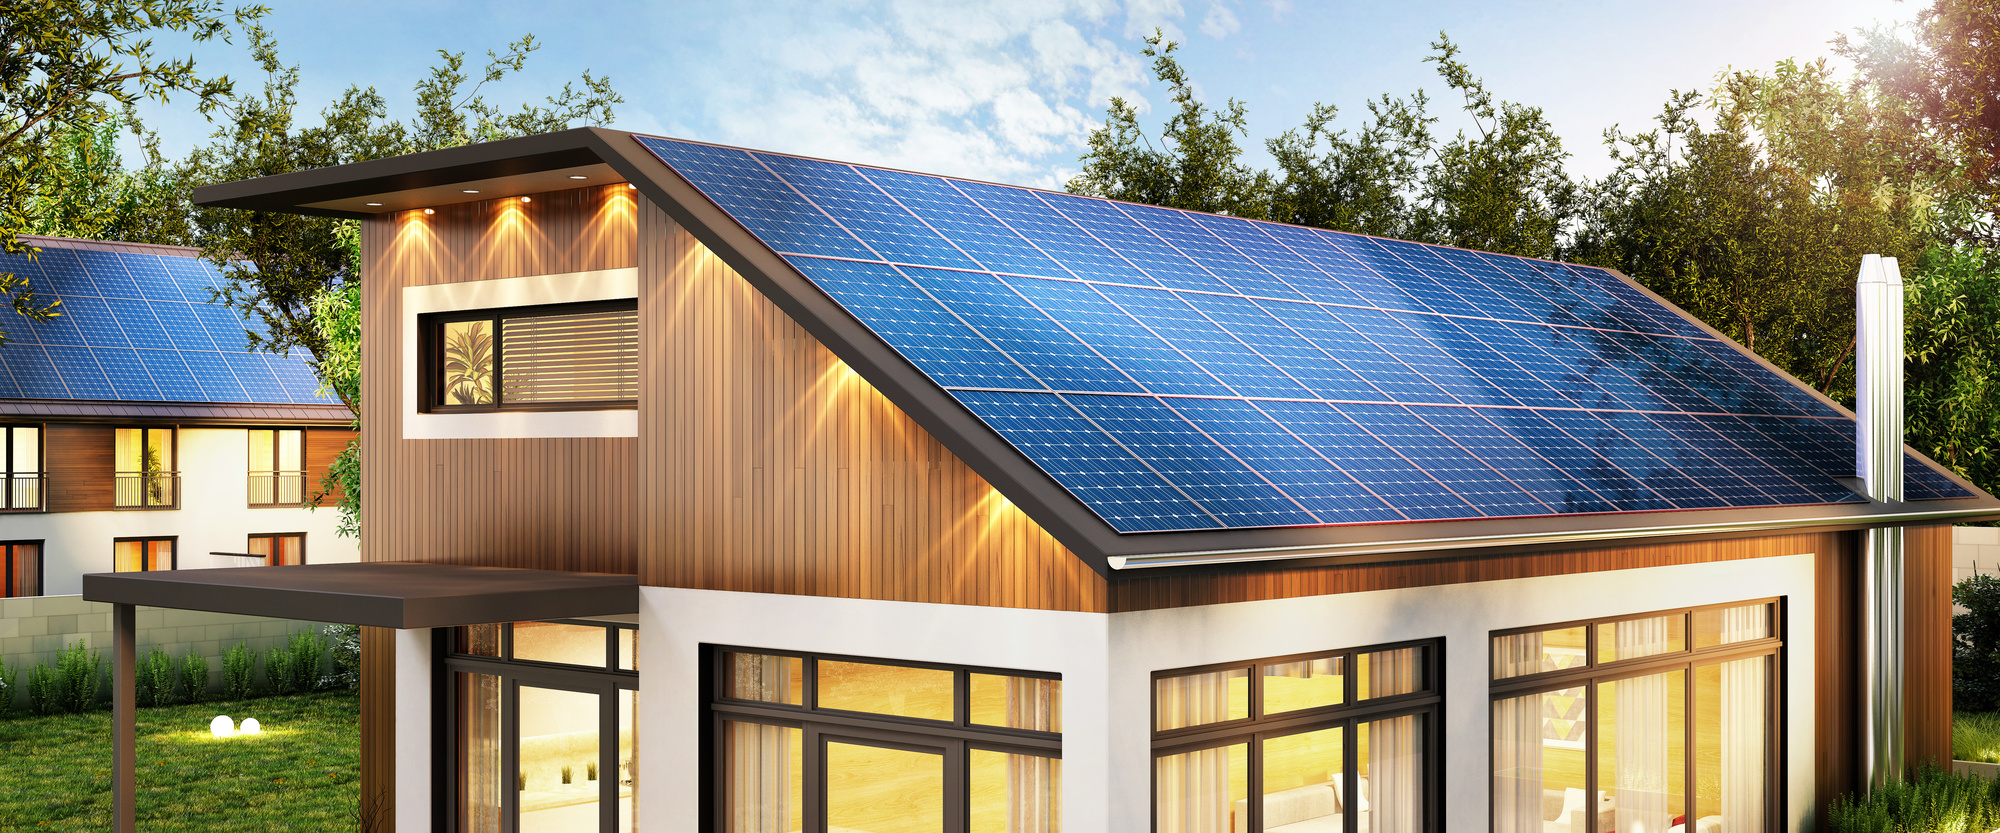 solar in kansas